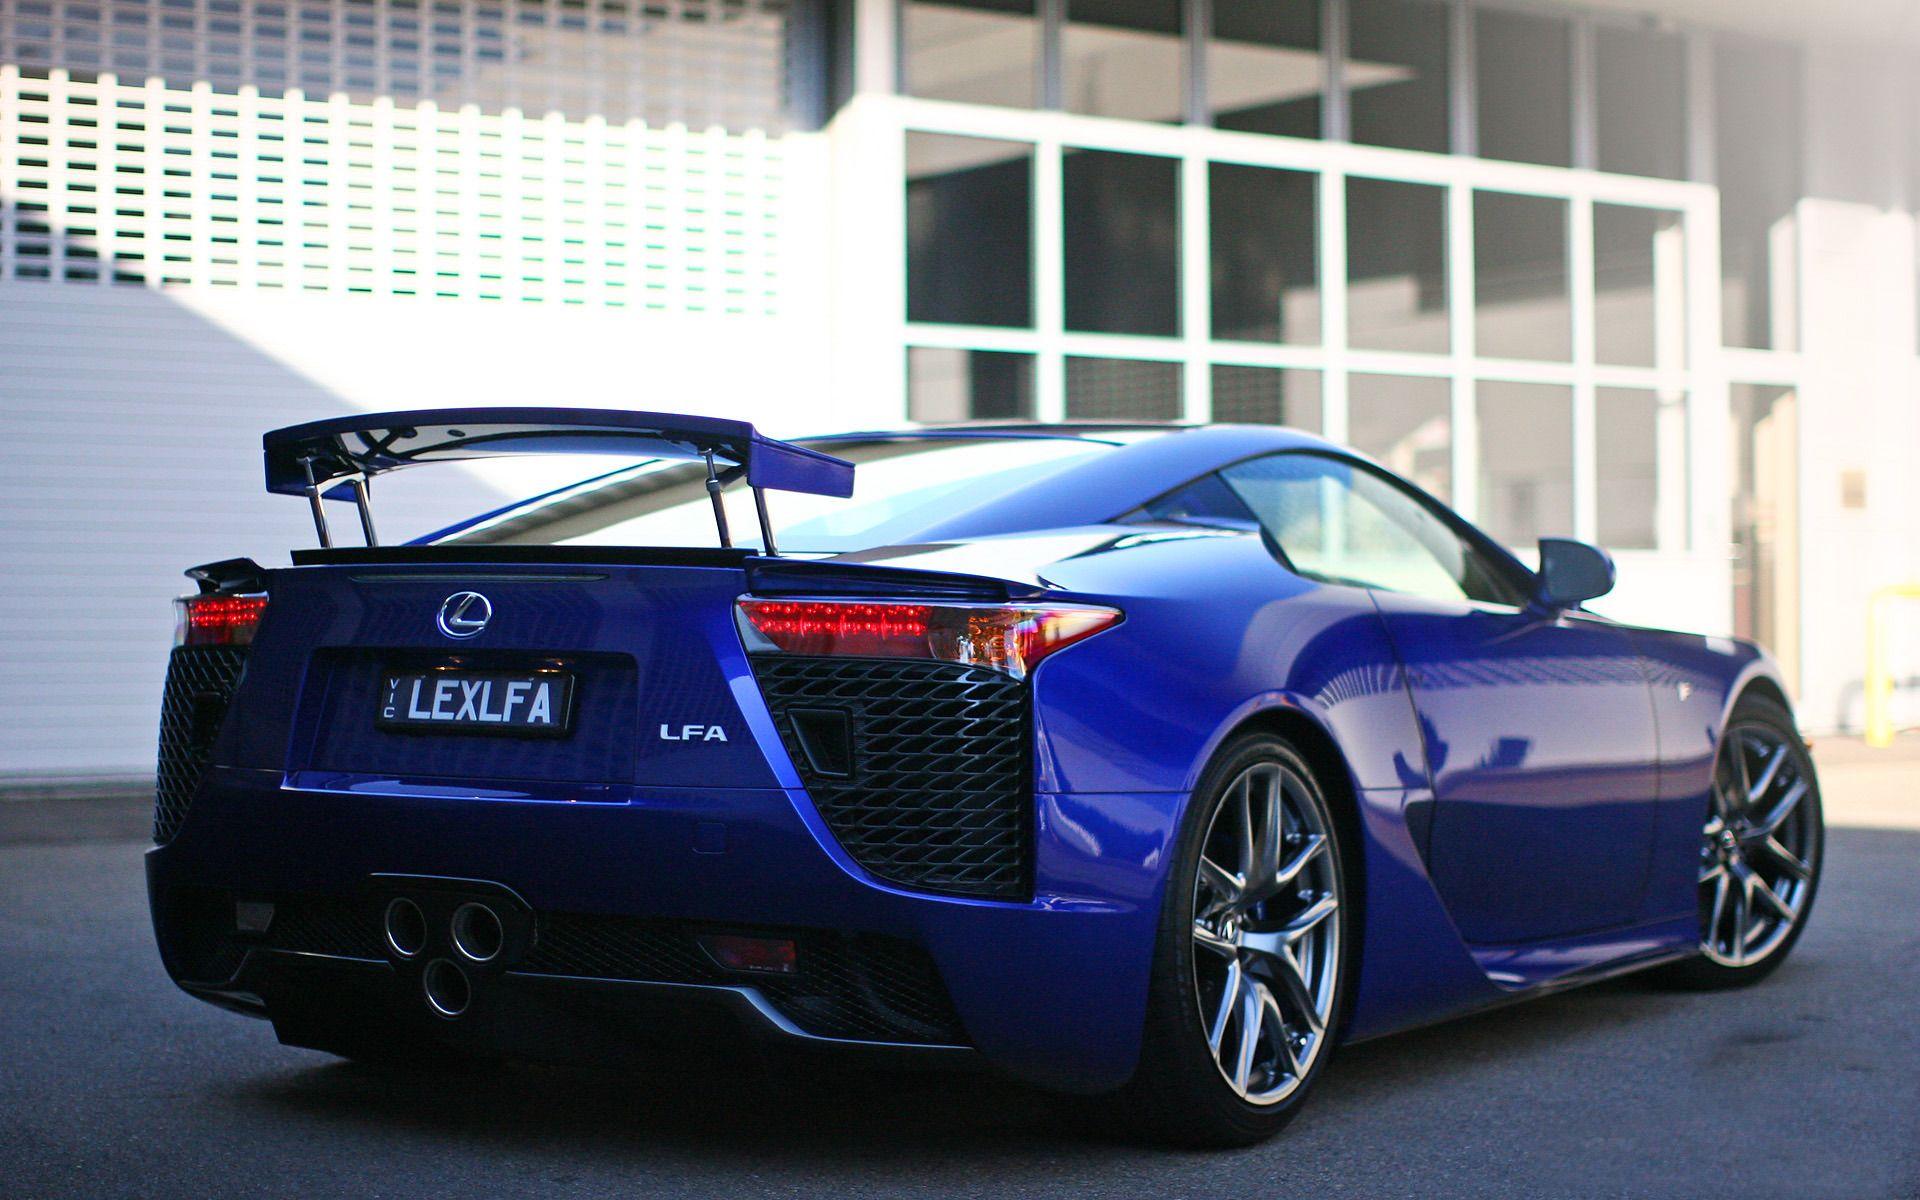 Lexus Lfa Car Hd Wallpaper Blue Lexus Lfa Pinterest Lexus Lfa